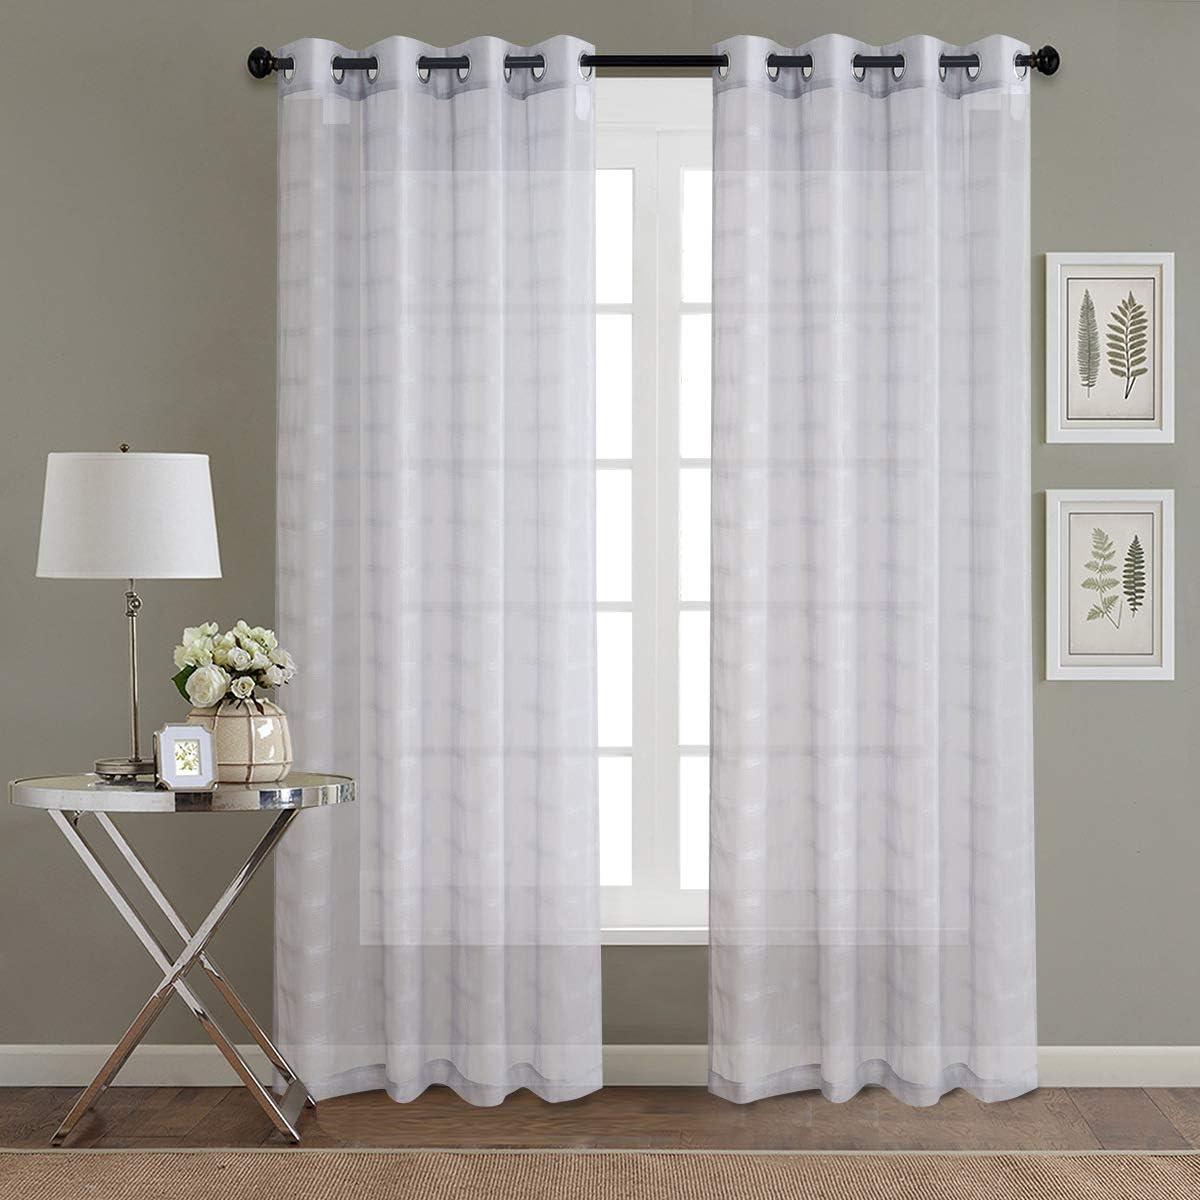 Gxi Grey Linen Sheer 新作送料無料 Curtains Lattice Living Room for Tu 卓越 Grommet